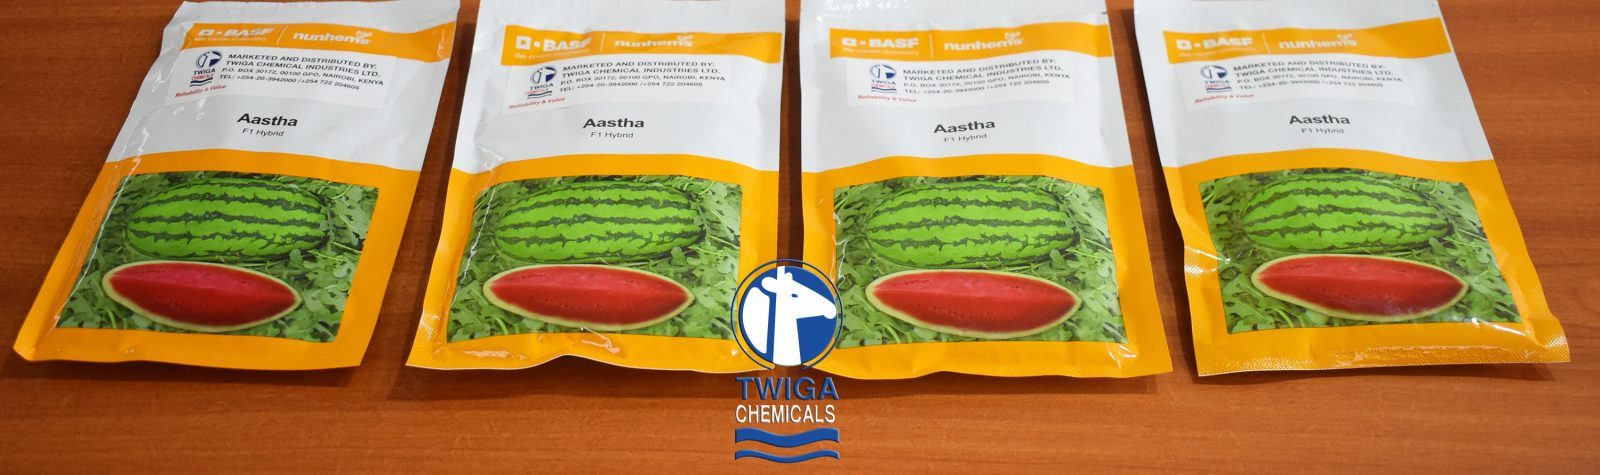 Hybrid Watermelon Vegetable Seeds